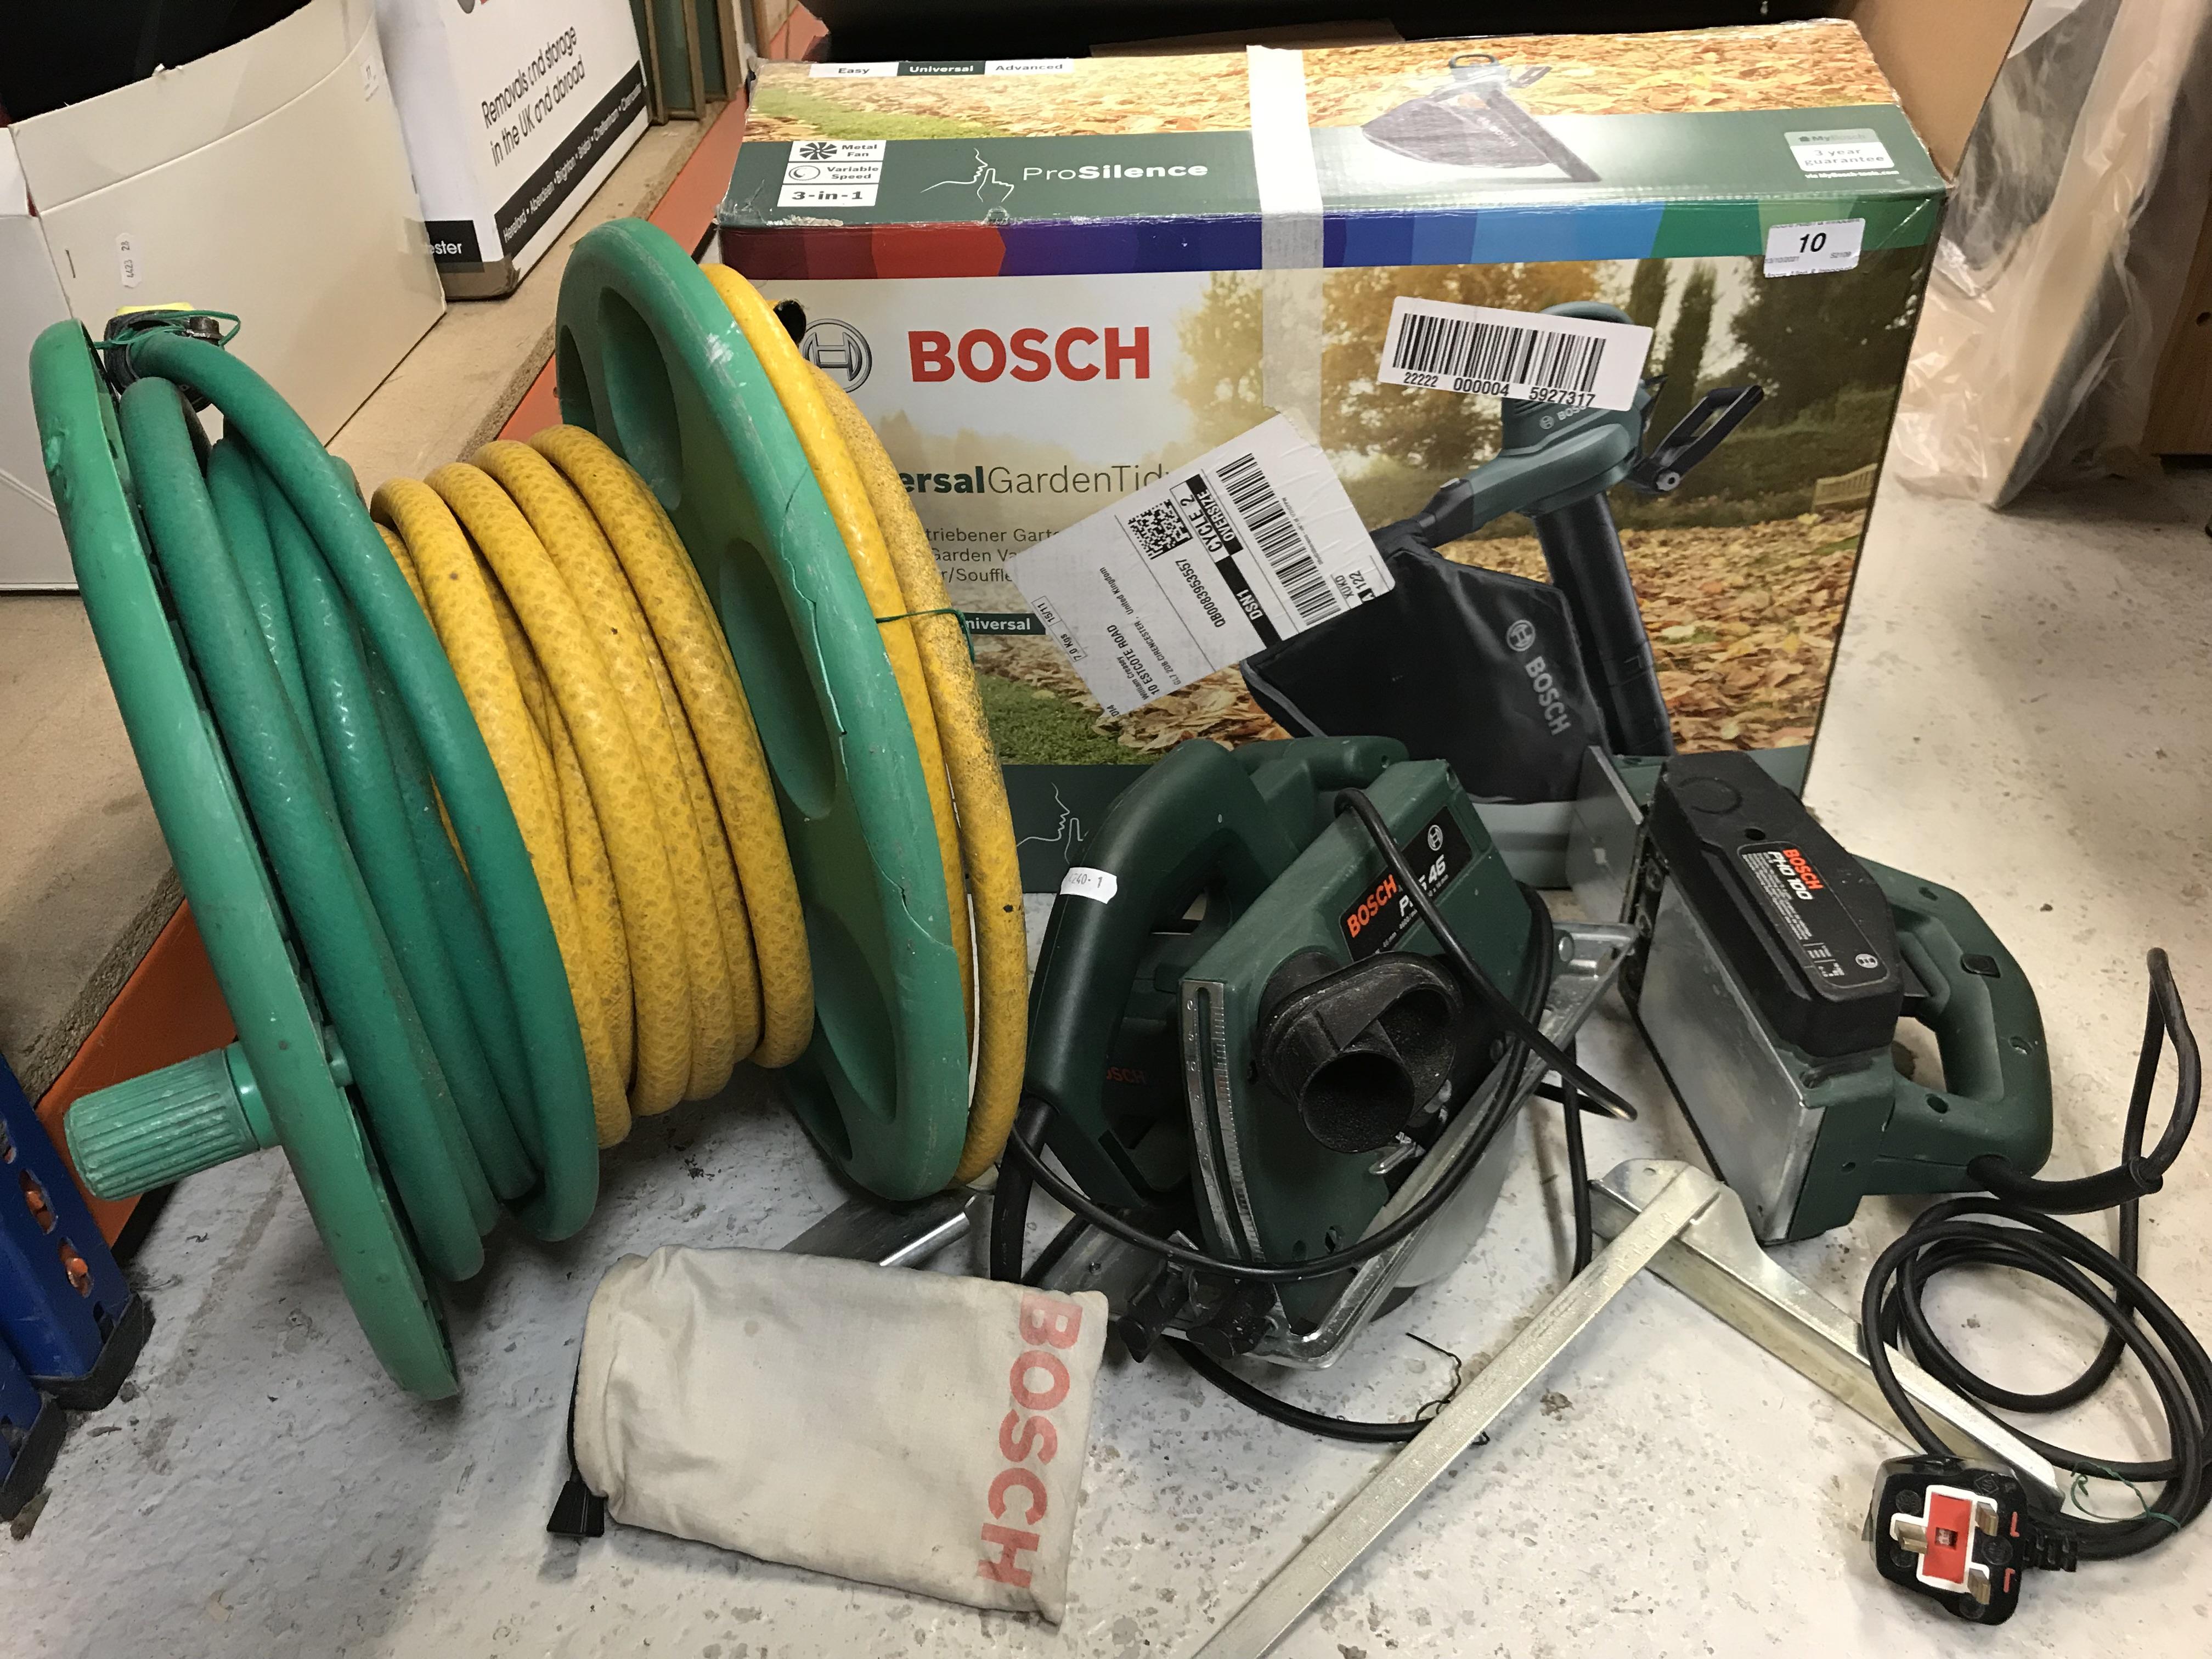 A Bosch universal garden tidy/leaf blower,